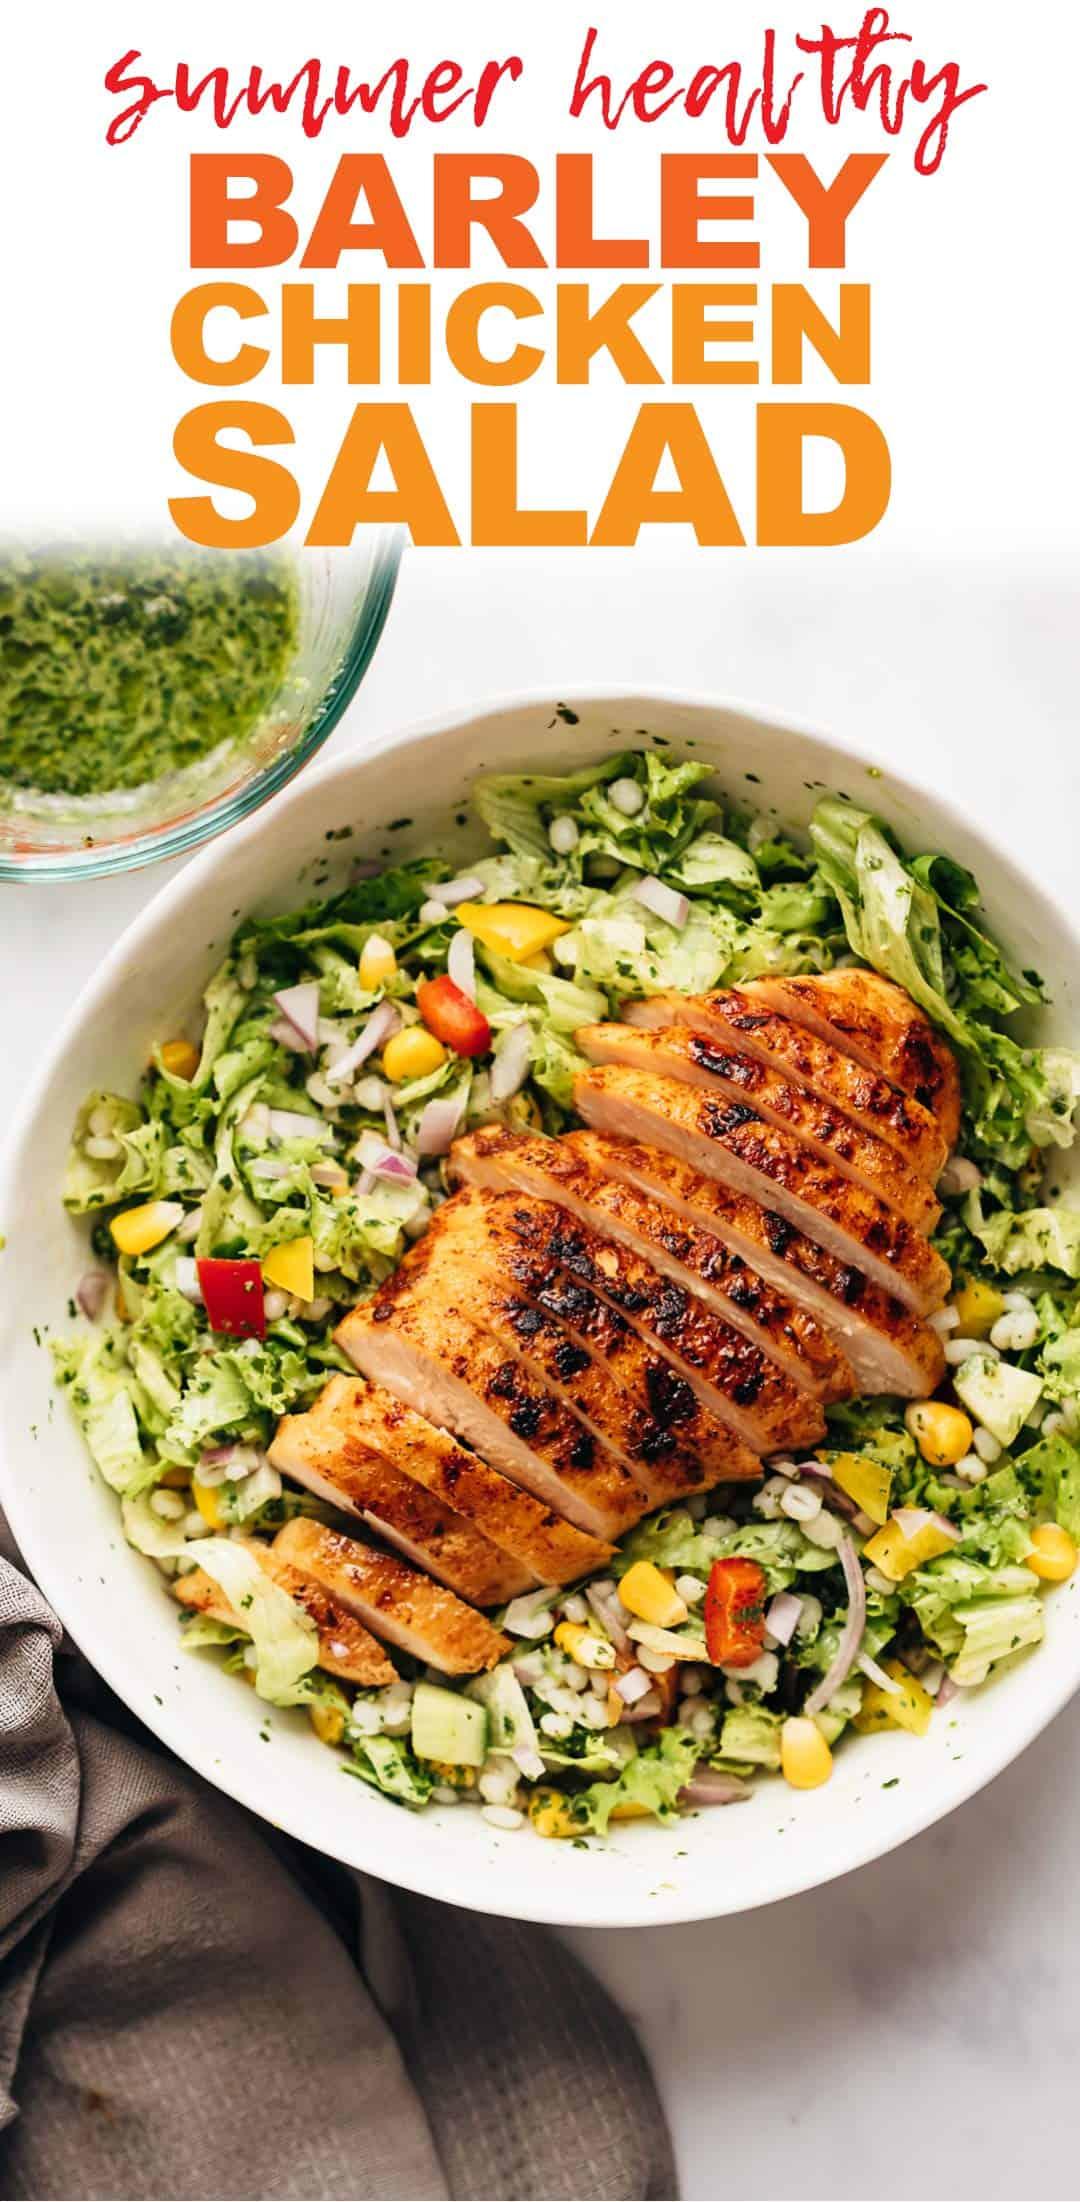 Barley Chicken Salad with Herb Vinaigrette